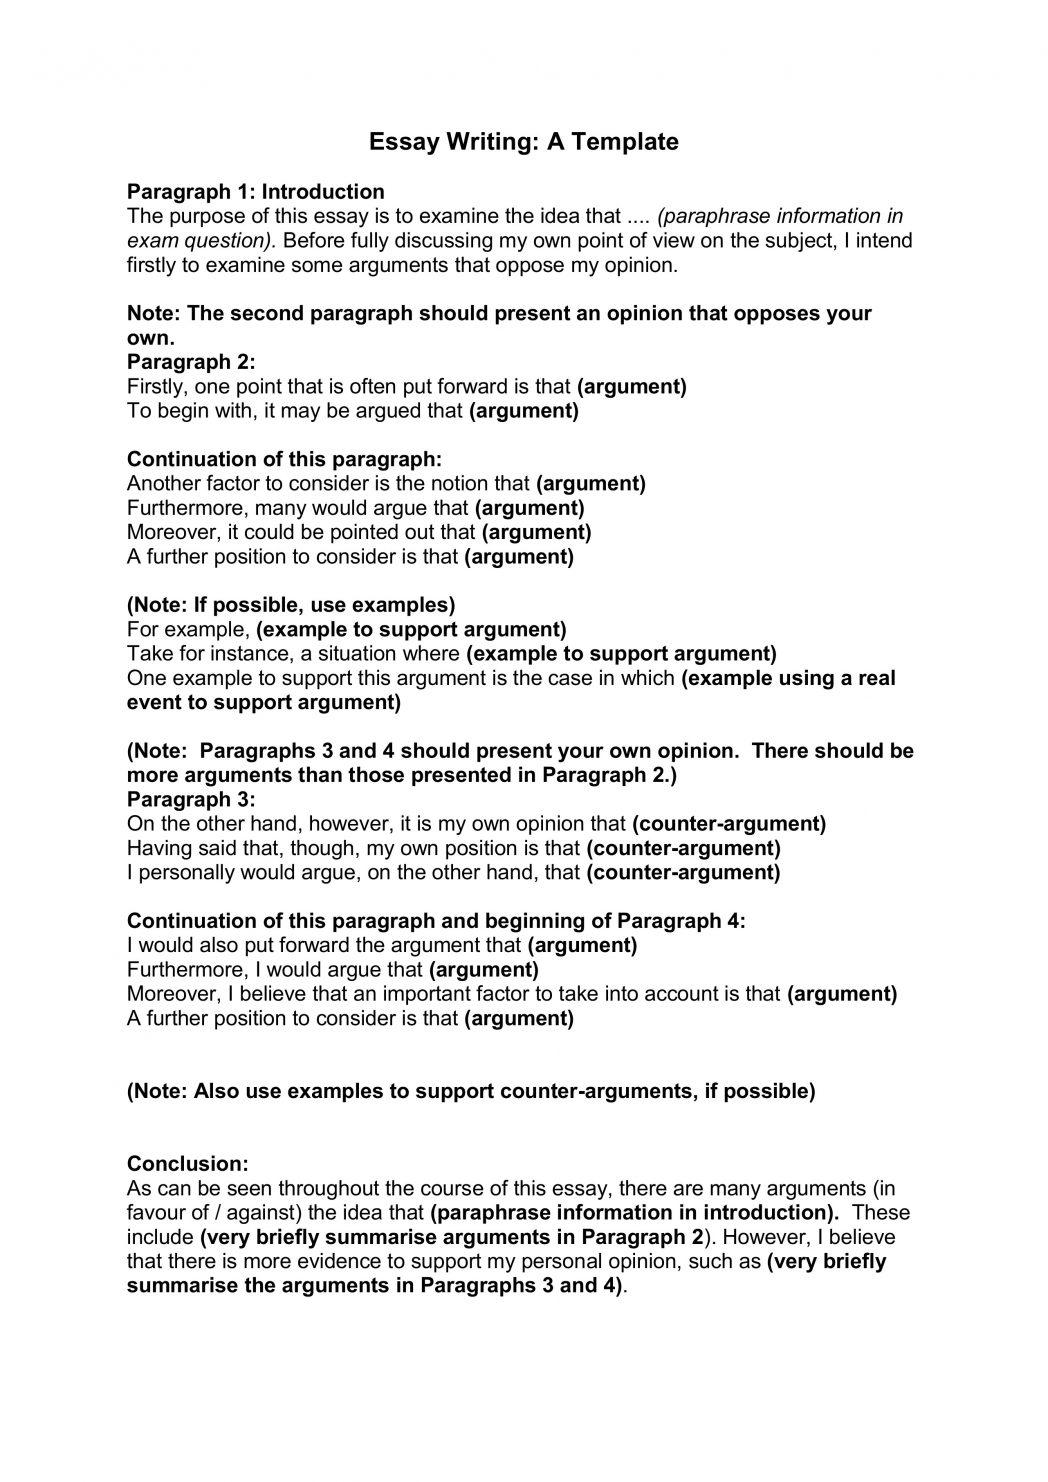 013 Argumentative Essay Hook Examples Example Toefl Samples Academic Good Hooks Writing Template For P Incredible Pdf Full